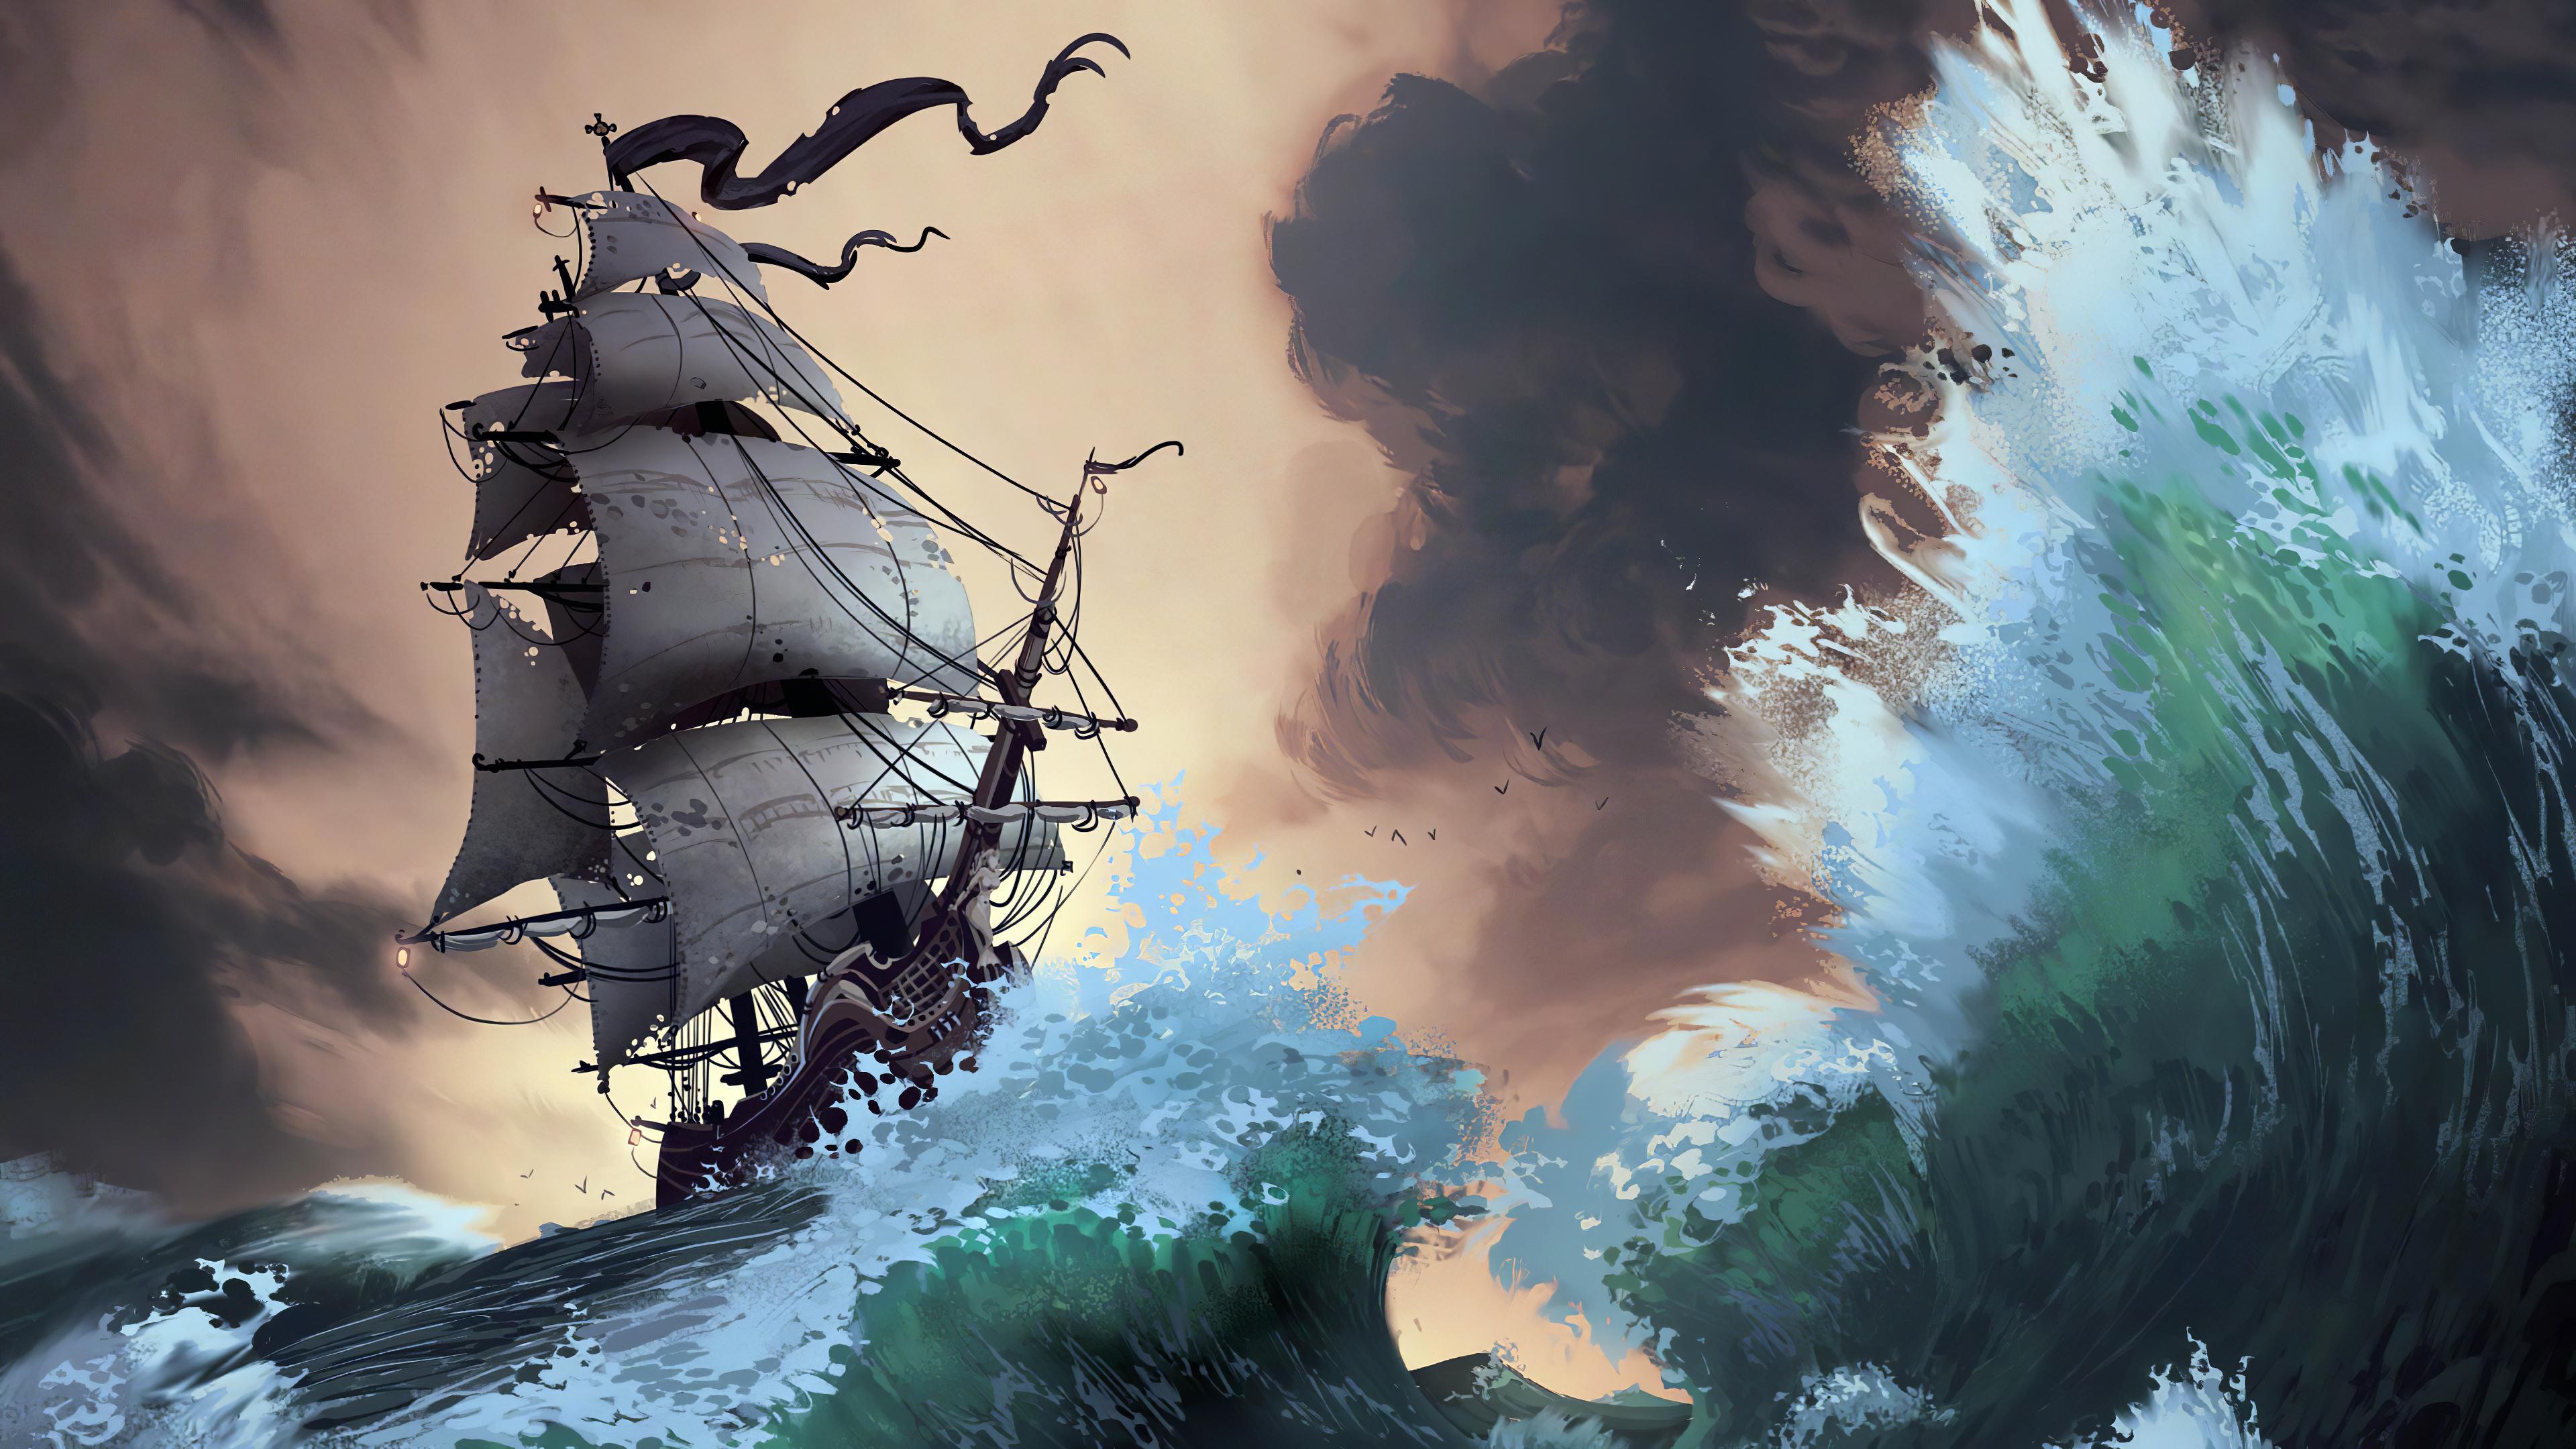 General 3840x2160 Lorenzo Lanfranconi artwork digital art ship storm waves Pirate ship